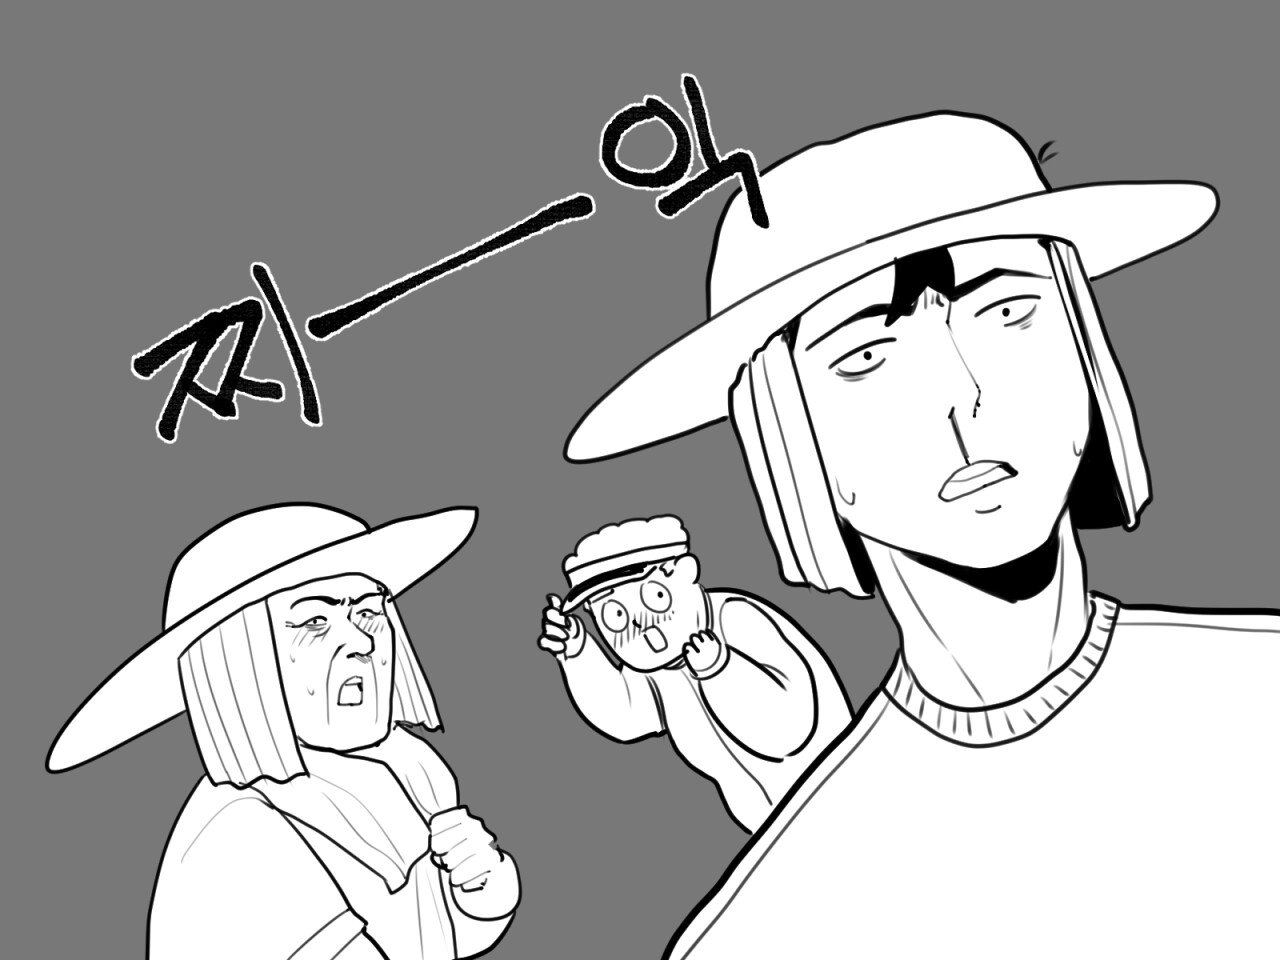 cartoon-20200407-235832-007.jpg ㅇㅎ) 우유 만드는 법.manhwa